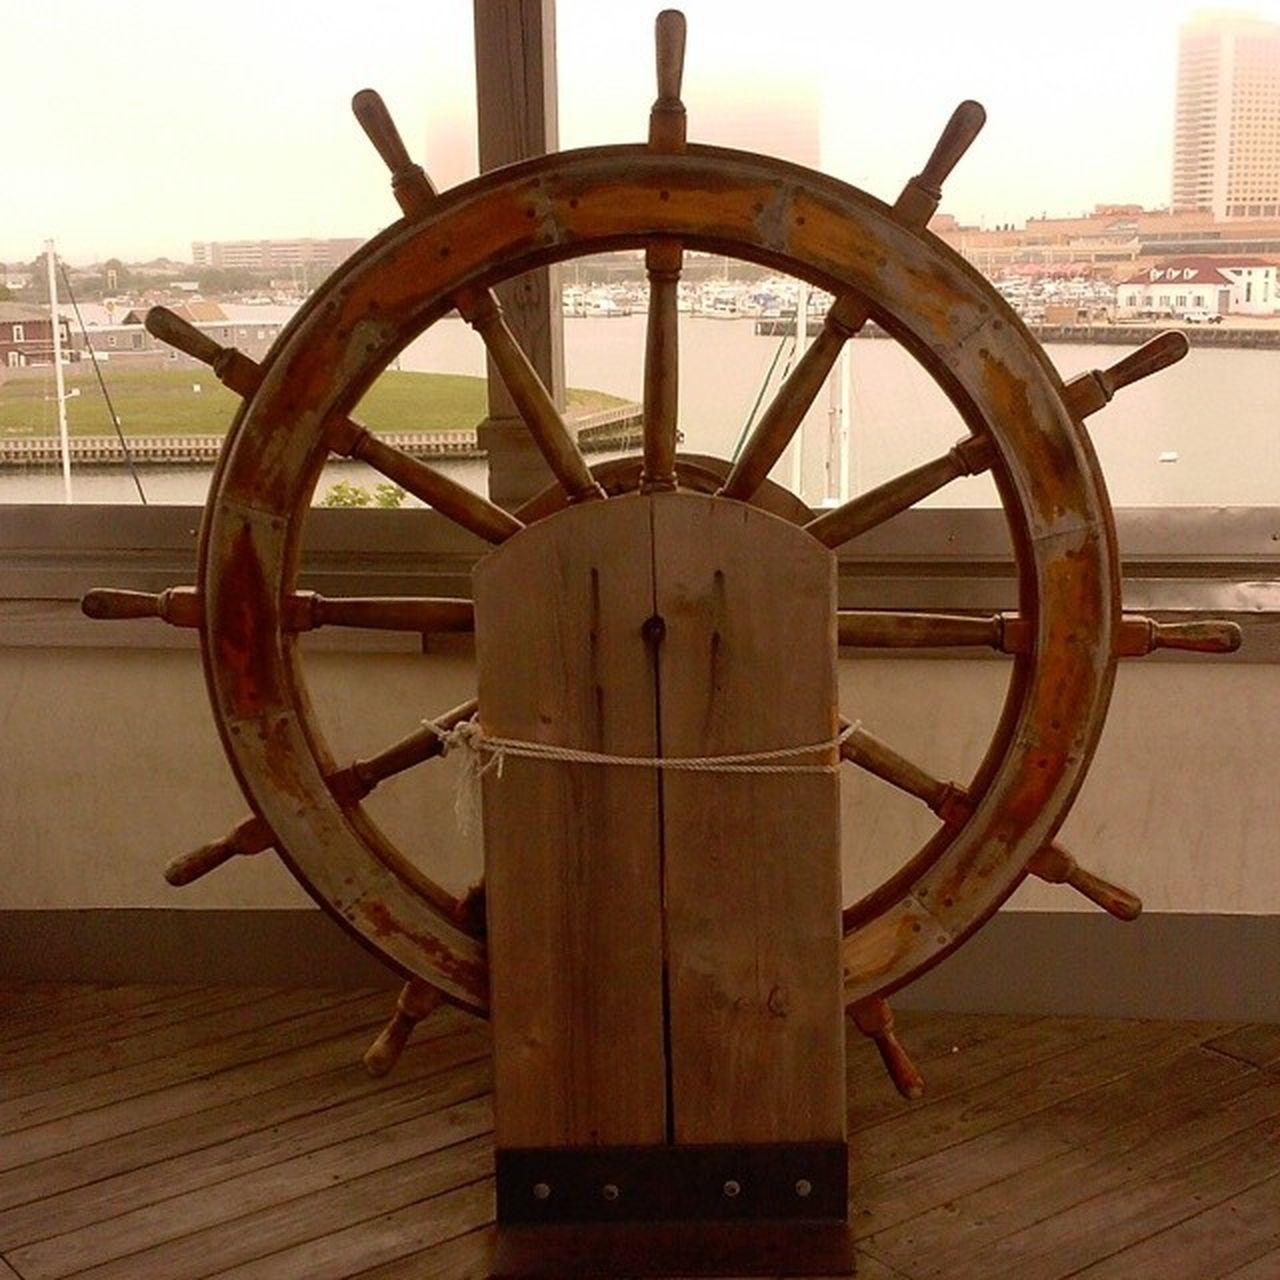 An Antique Nautical Wheel In Ac Atlantic City Wood Oceanside Ocean Life No People